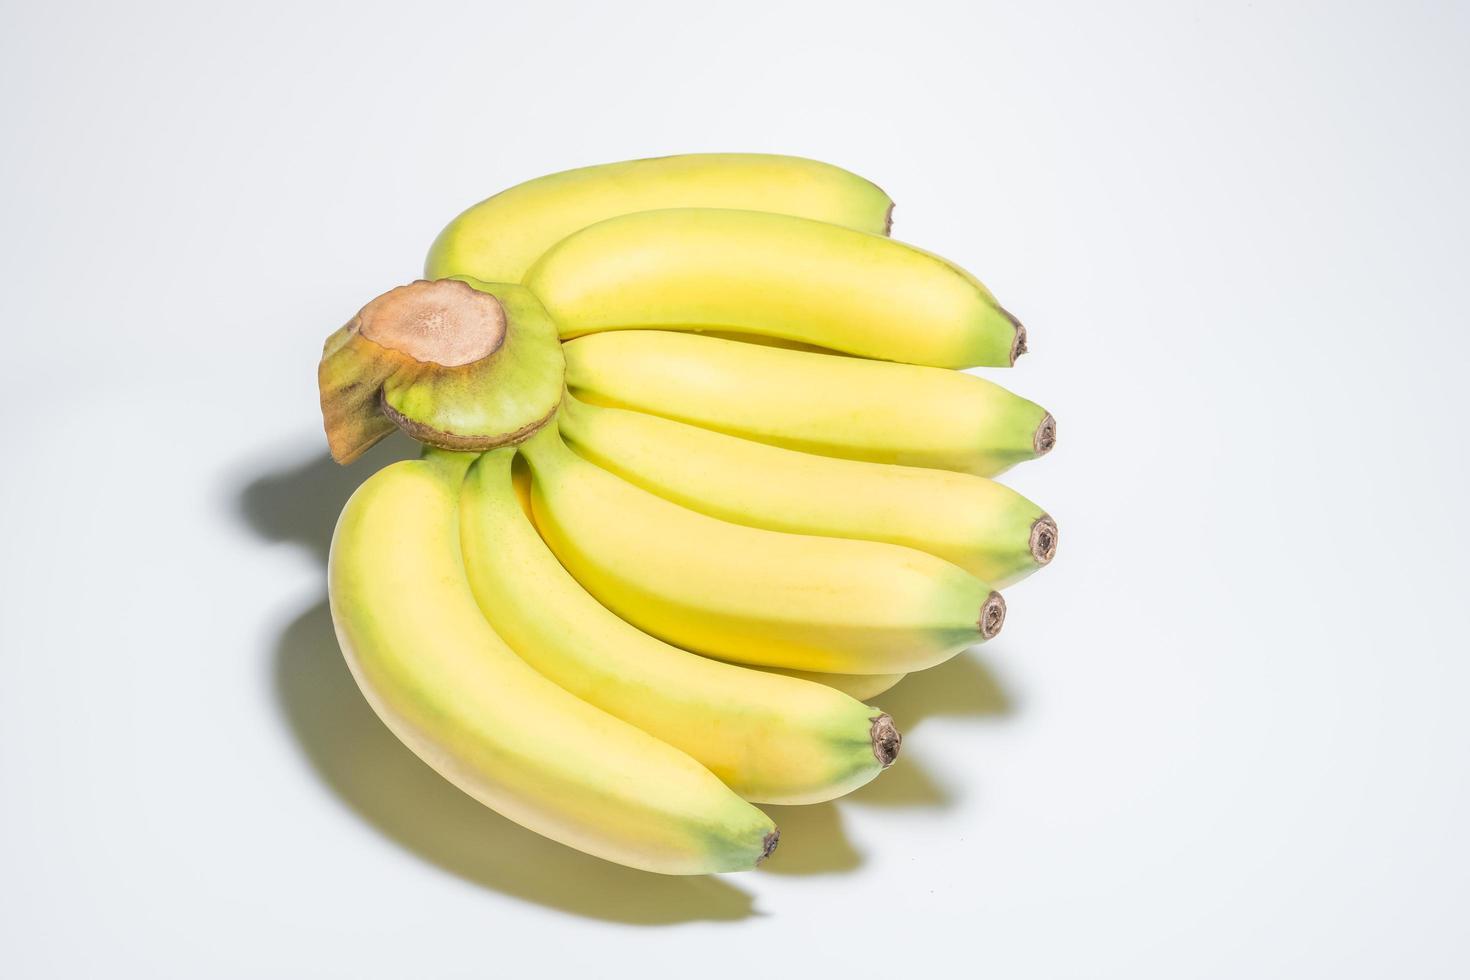 bananes sur fond blanc photo